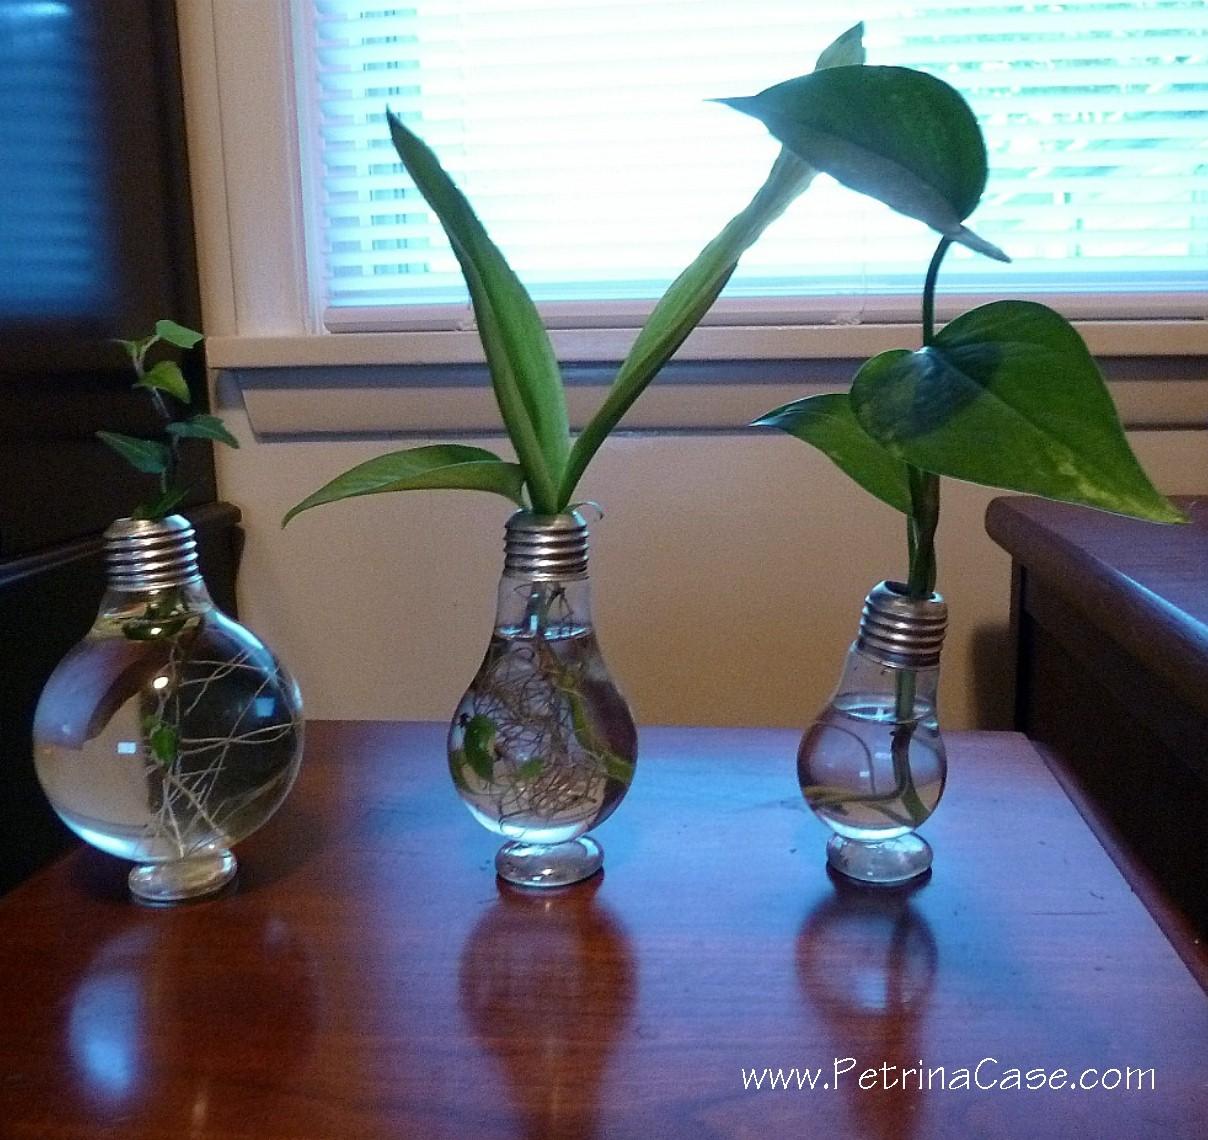 Petrina Case Studio Recycle A Used Light Bulb